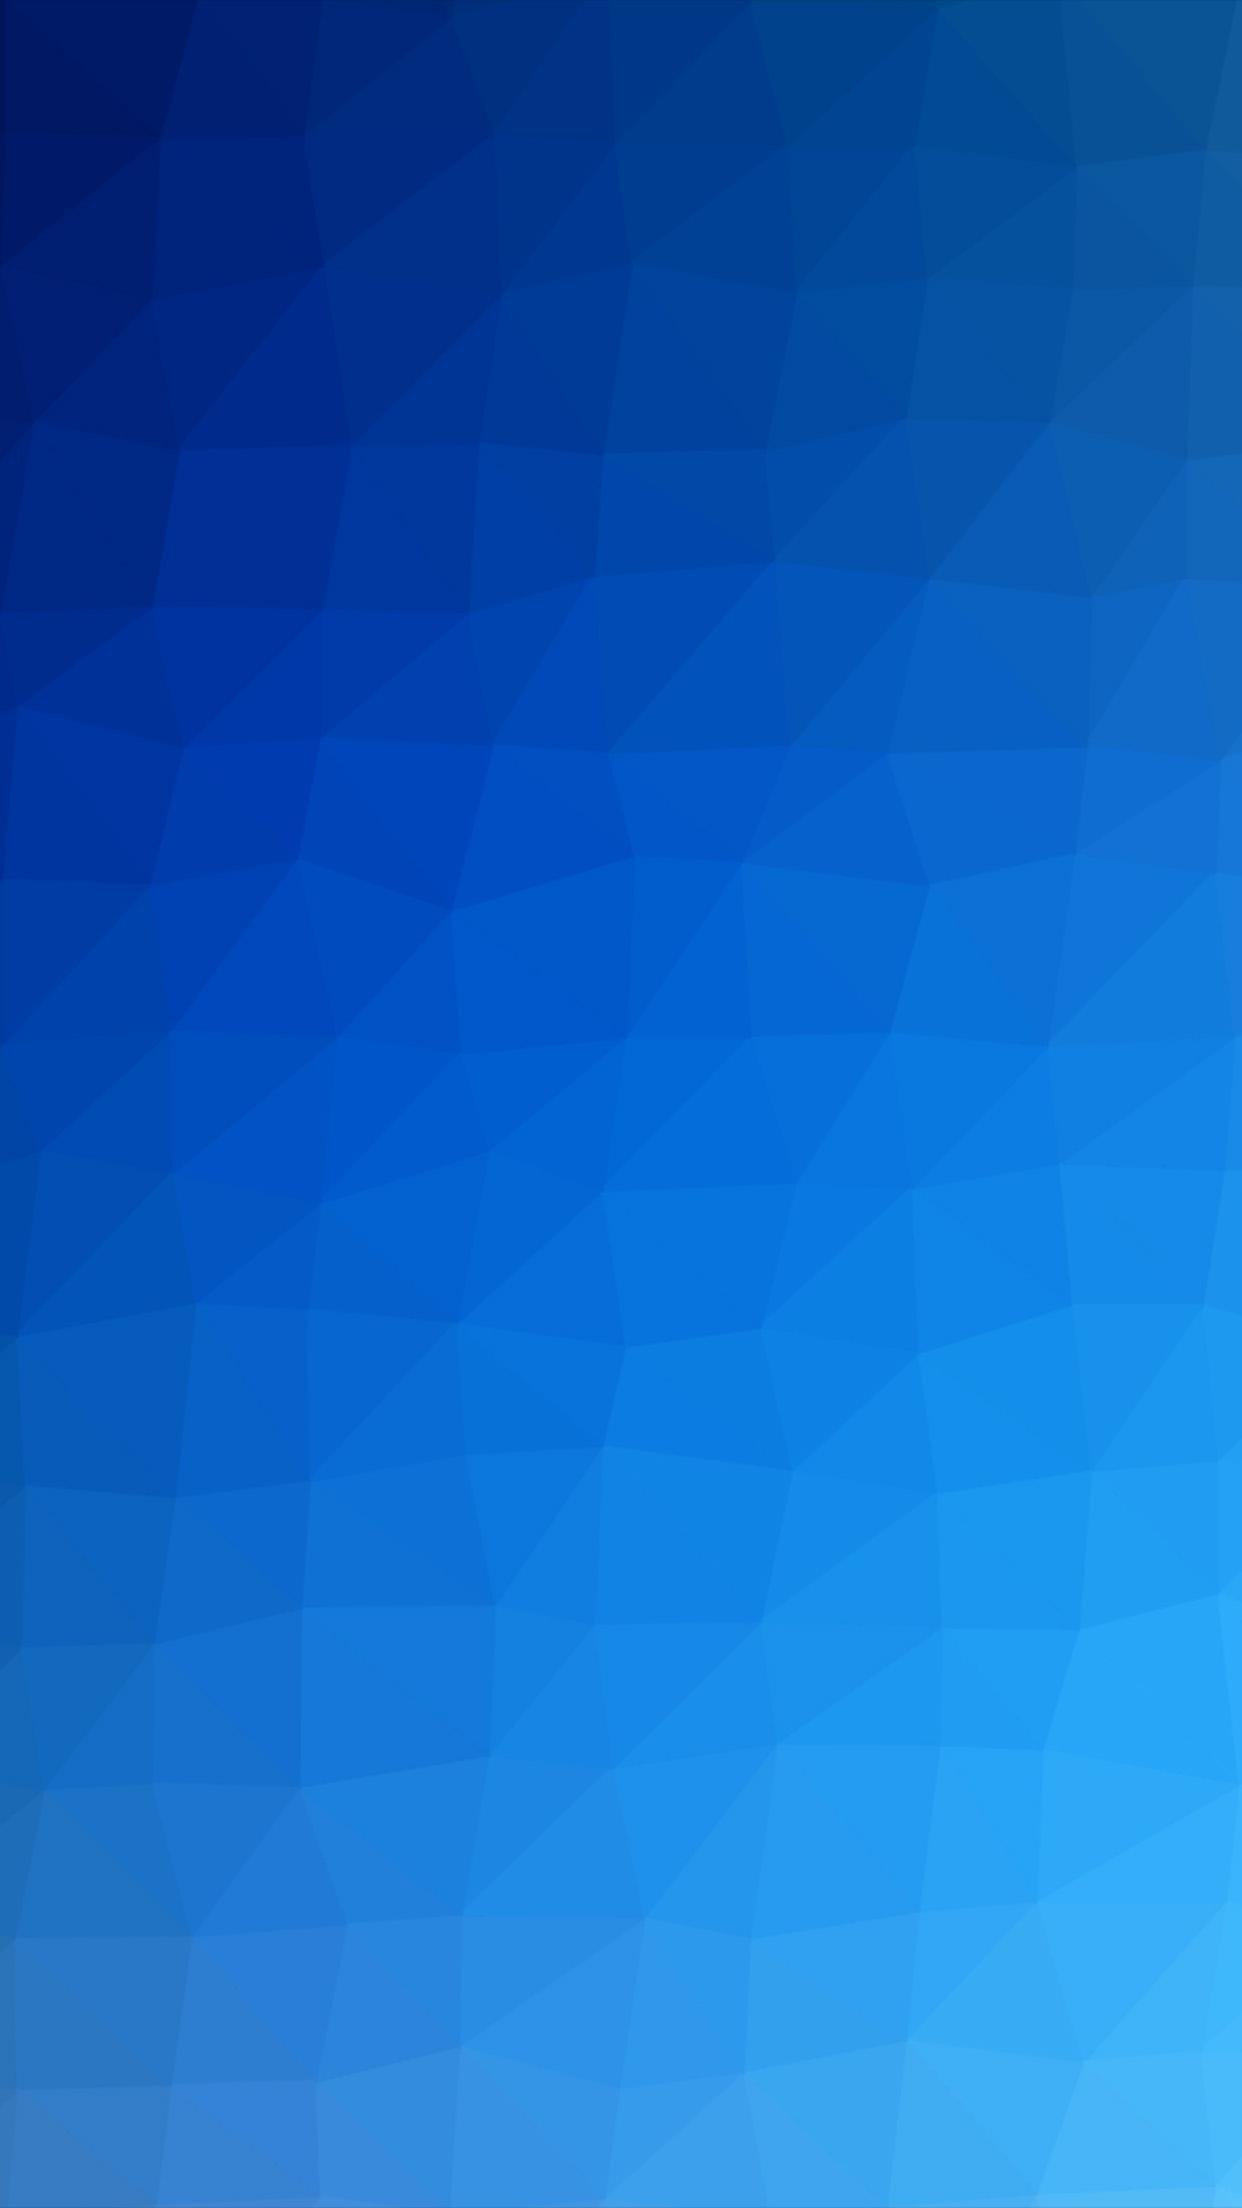 Ipad Wallpaper Simple